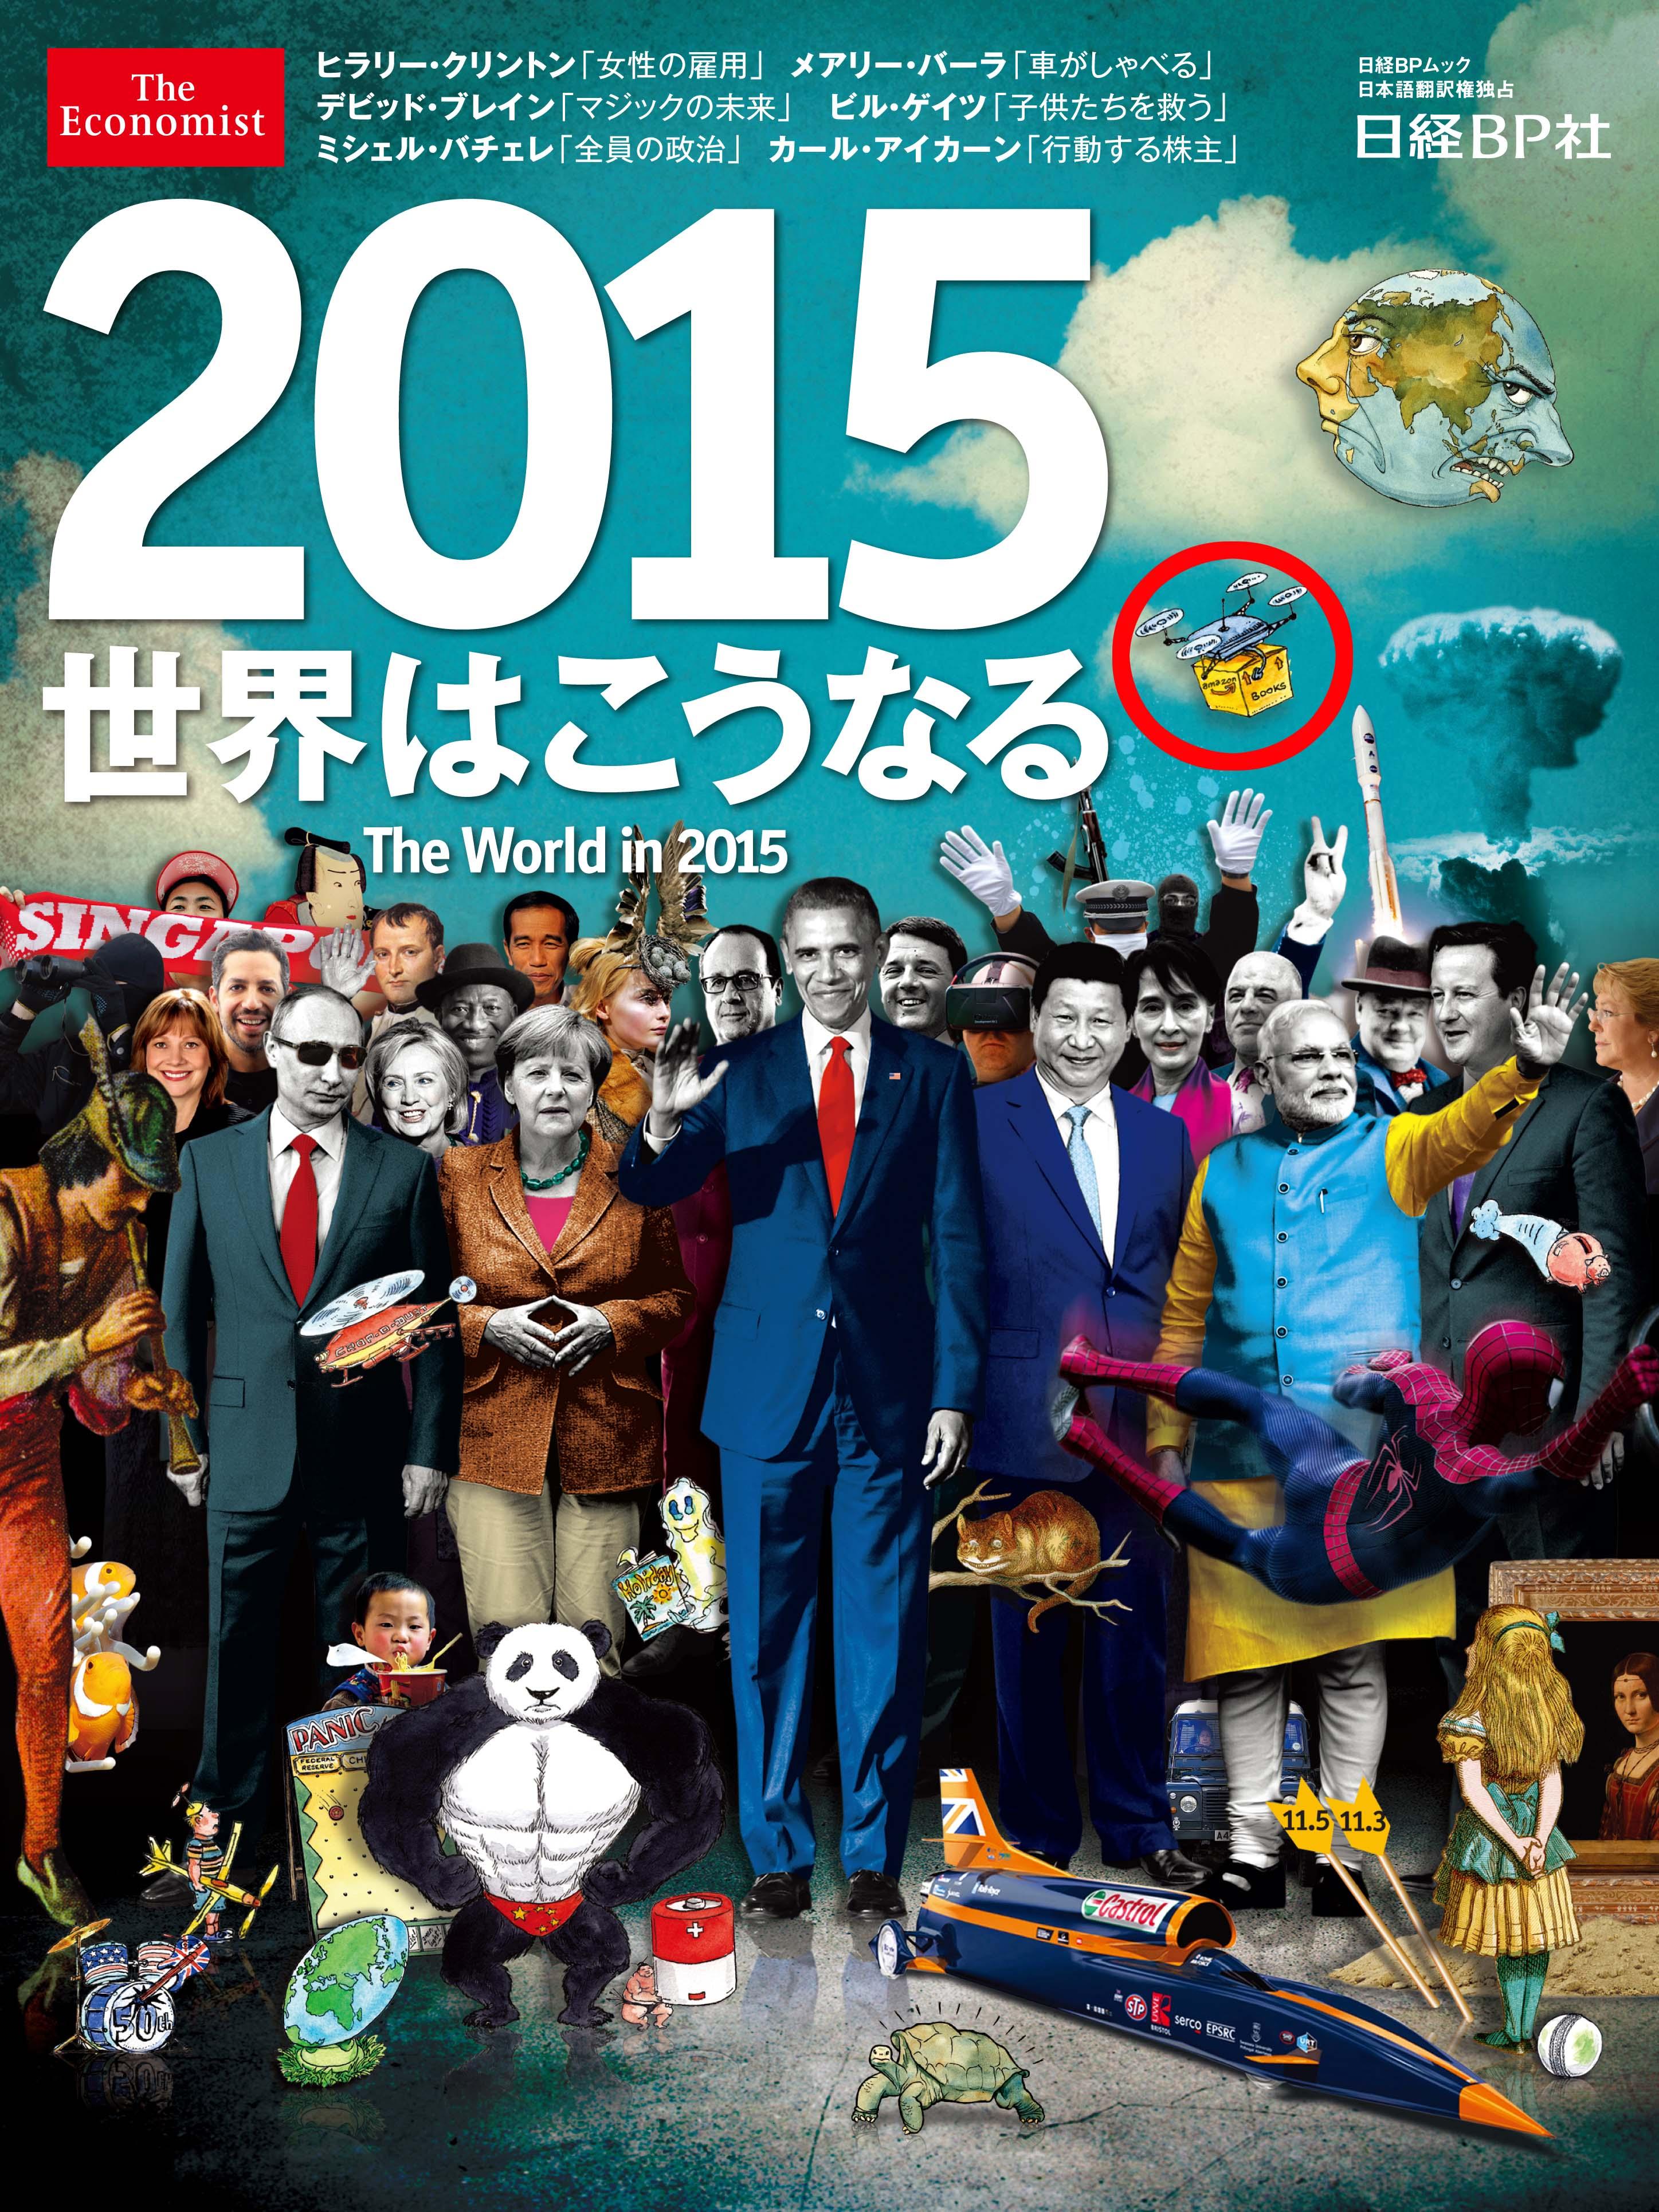 Economist2014_cover_入稿ol